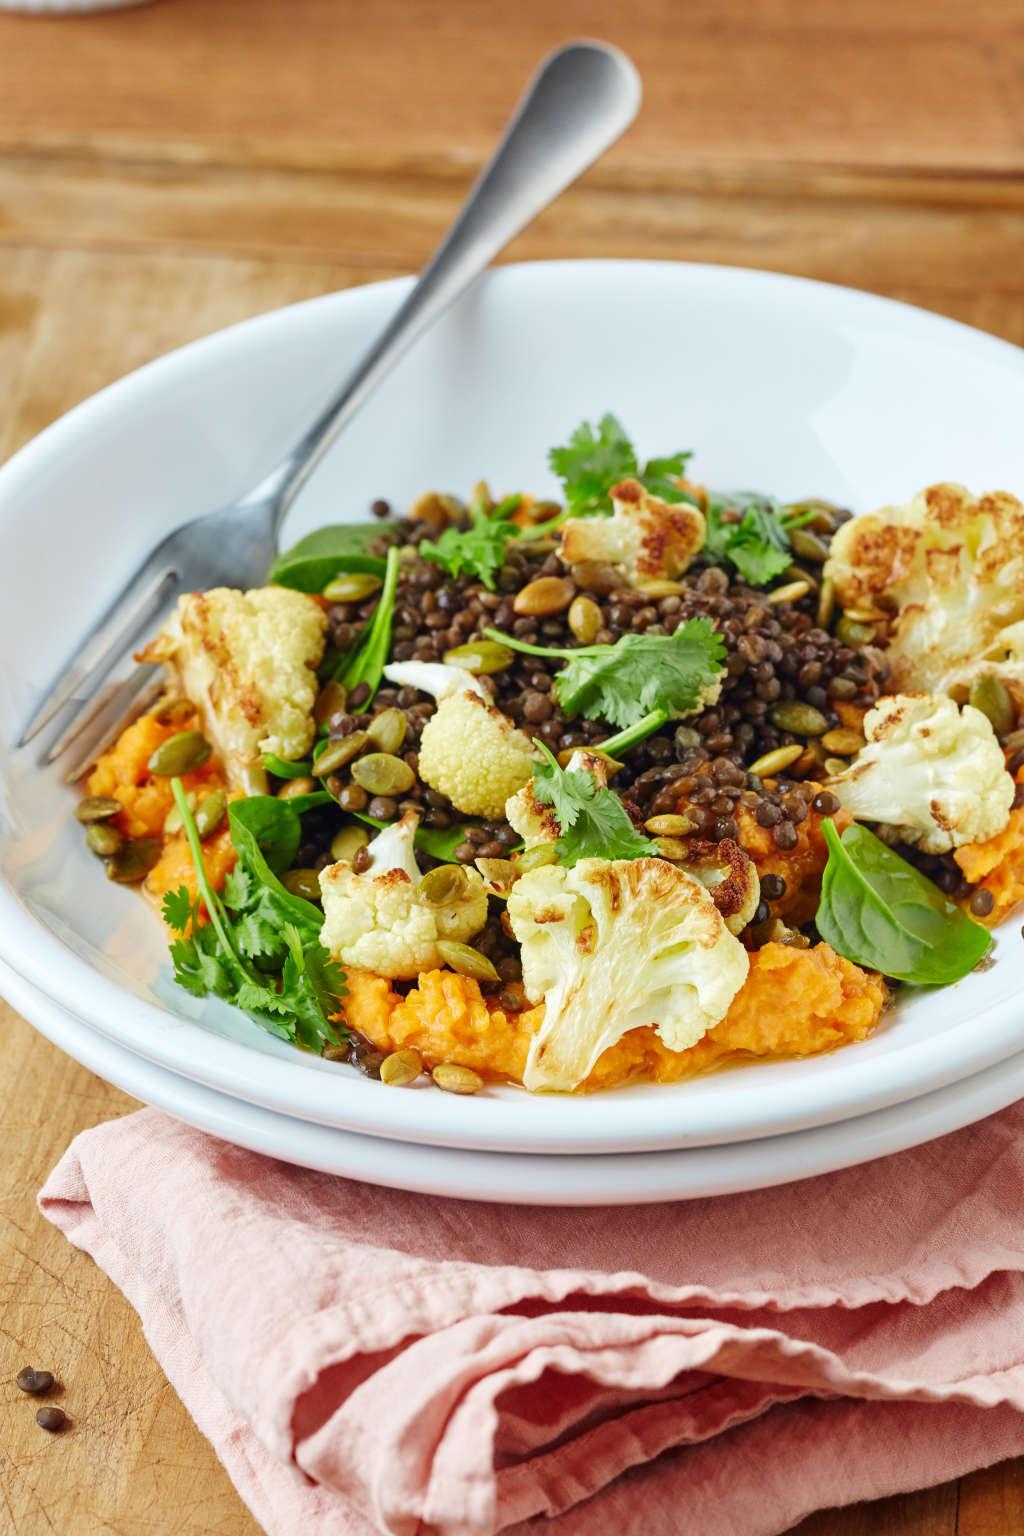 The Best Make-Ahead Vegetarian Dinner You'll See This Week